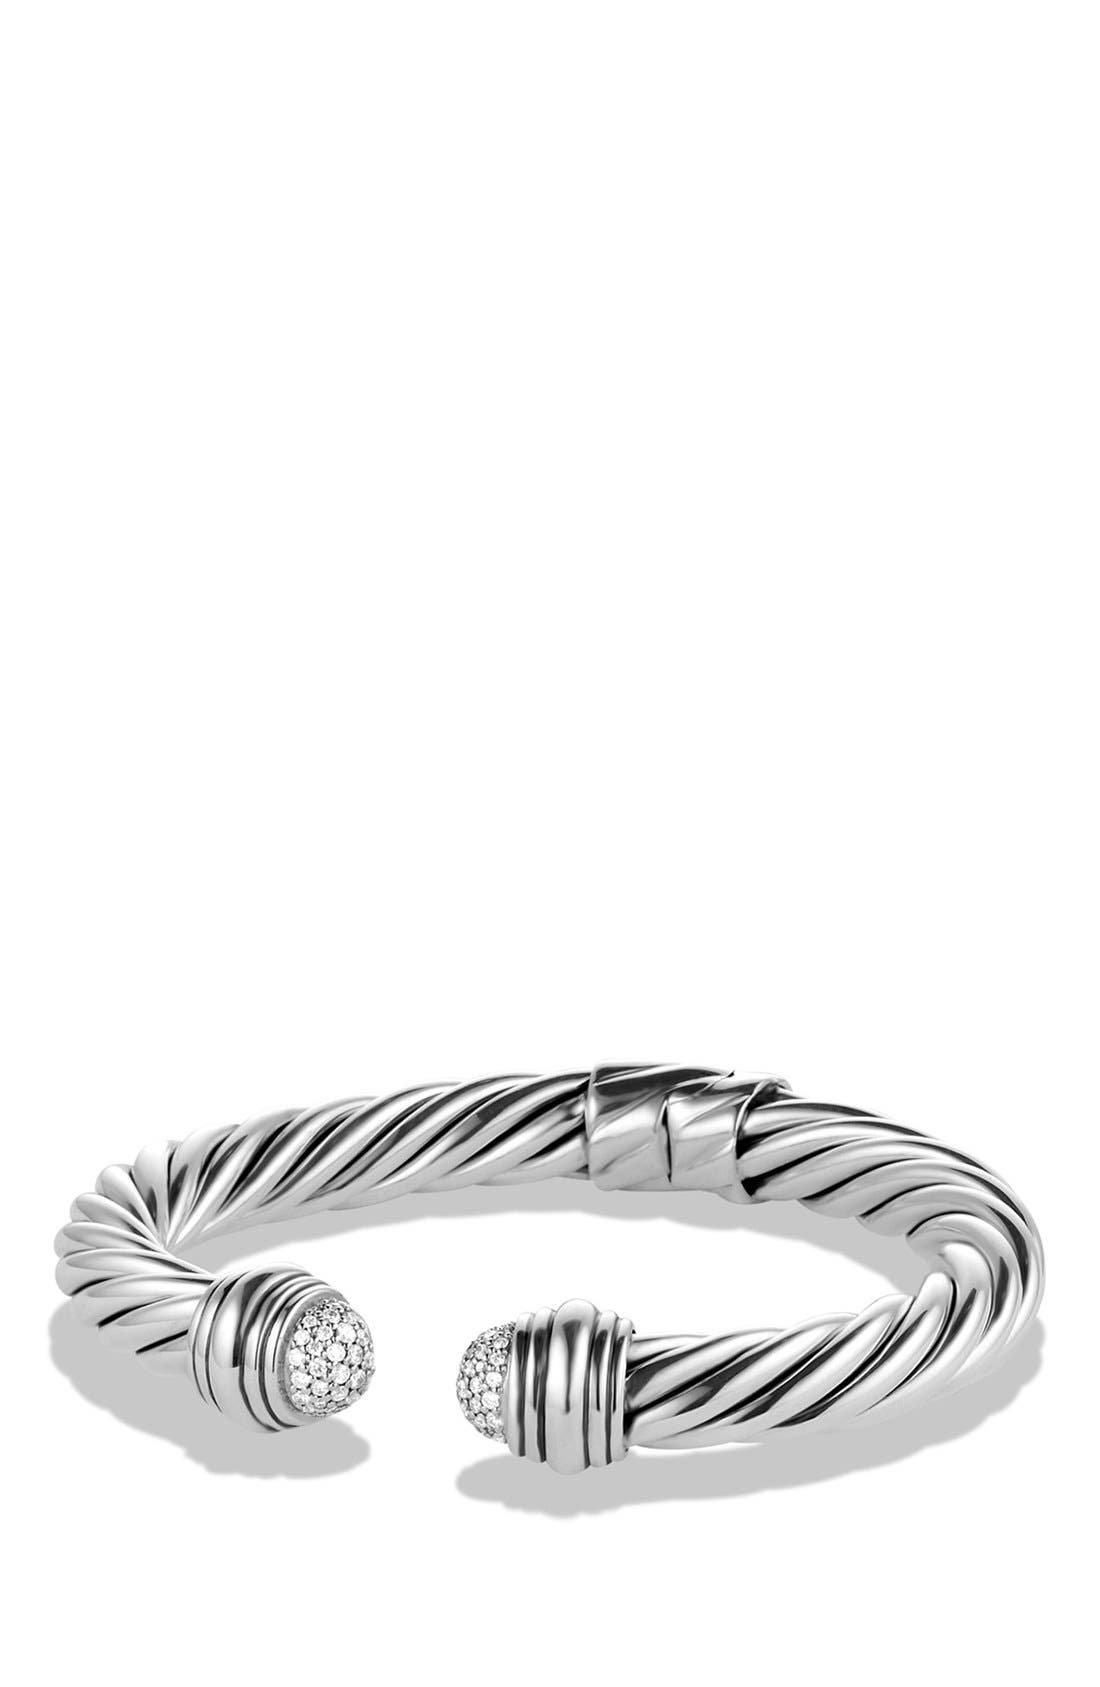 Main Image - David Yurman Cable Classics Pavé Tip Bracelet with Diamonds, 8.5mm